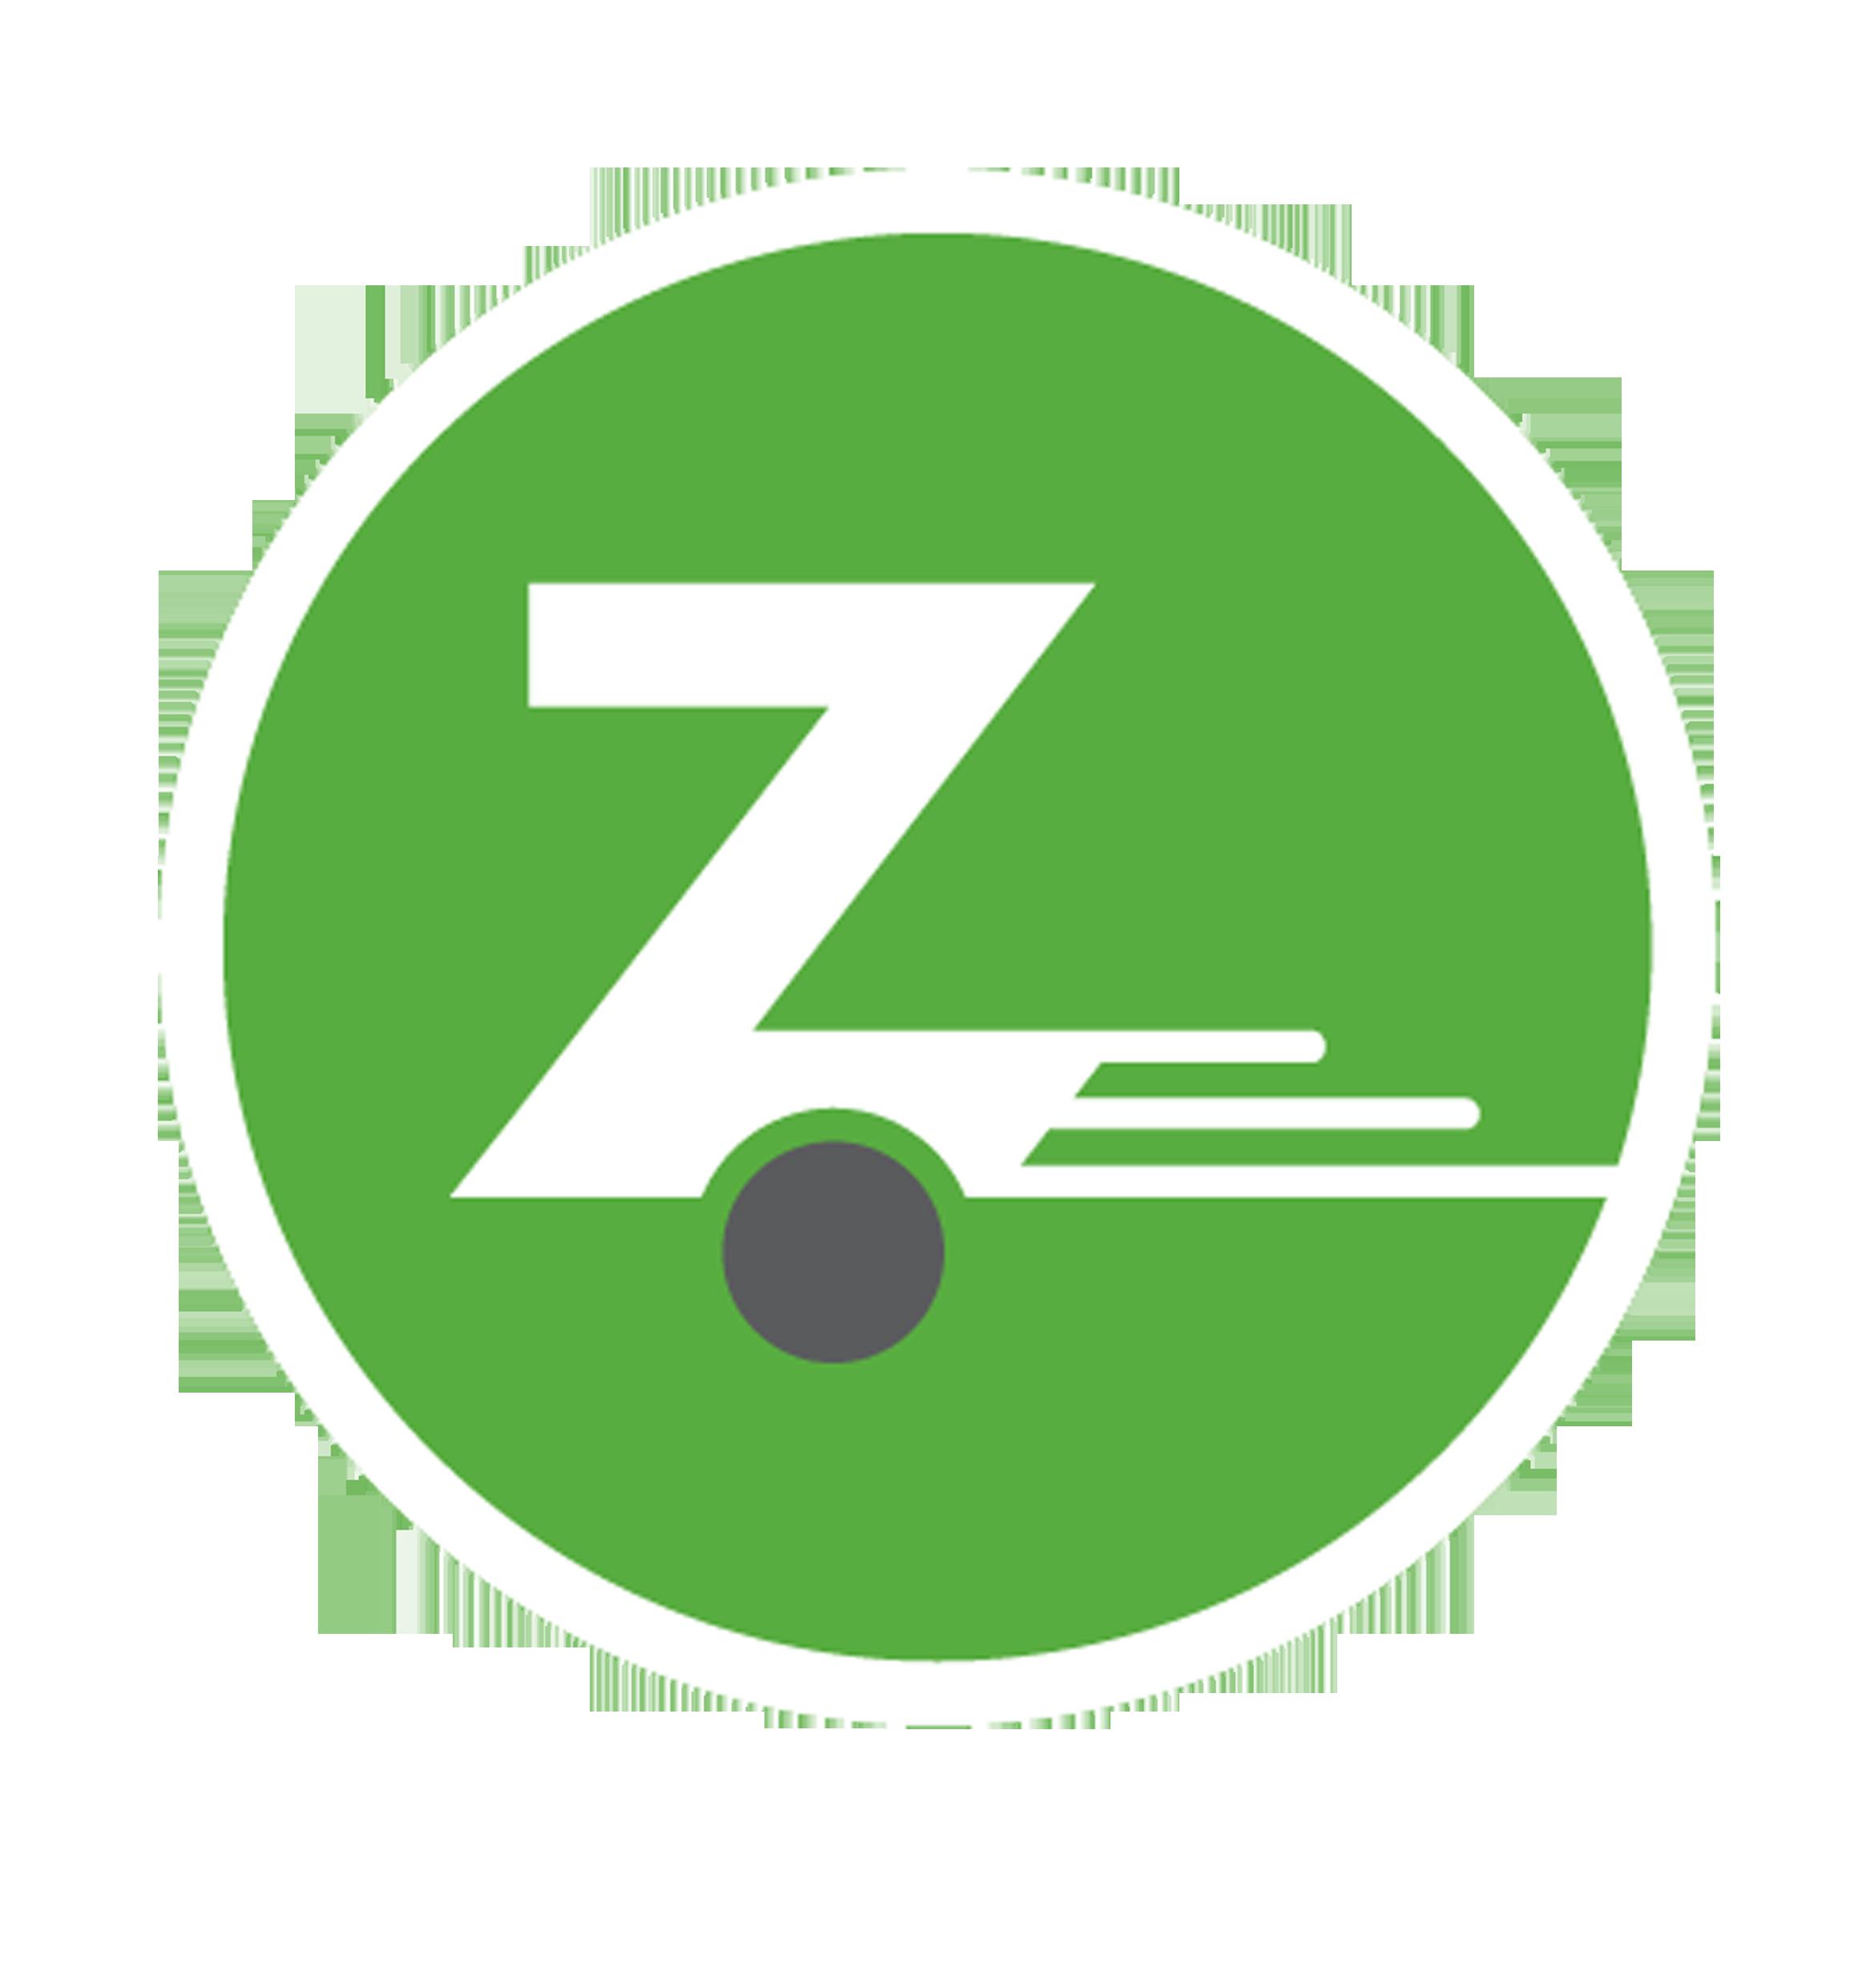 Avatar - Ziptopia by Zipcar